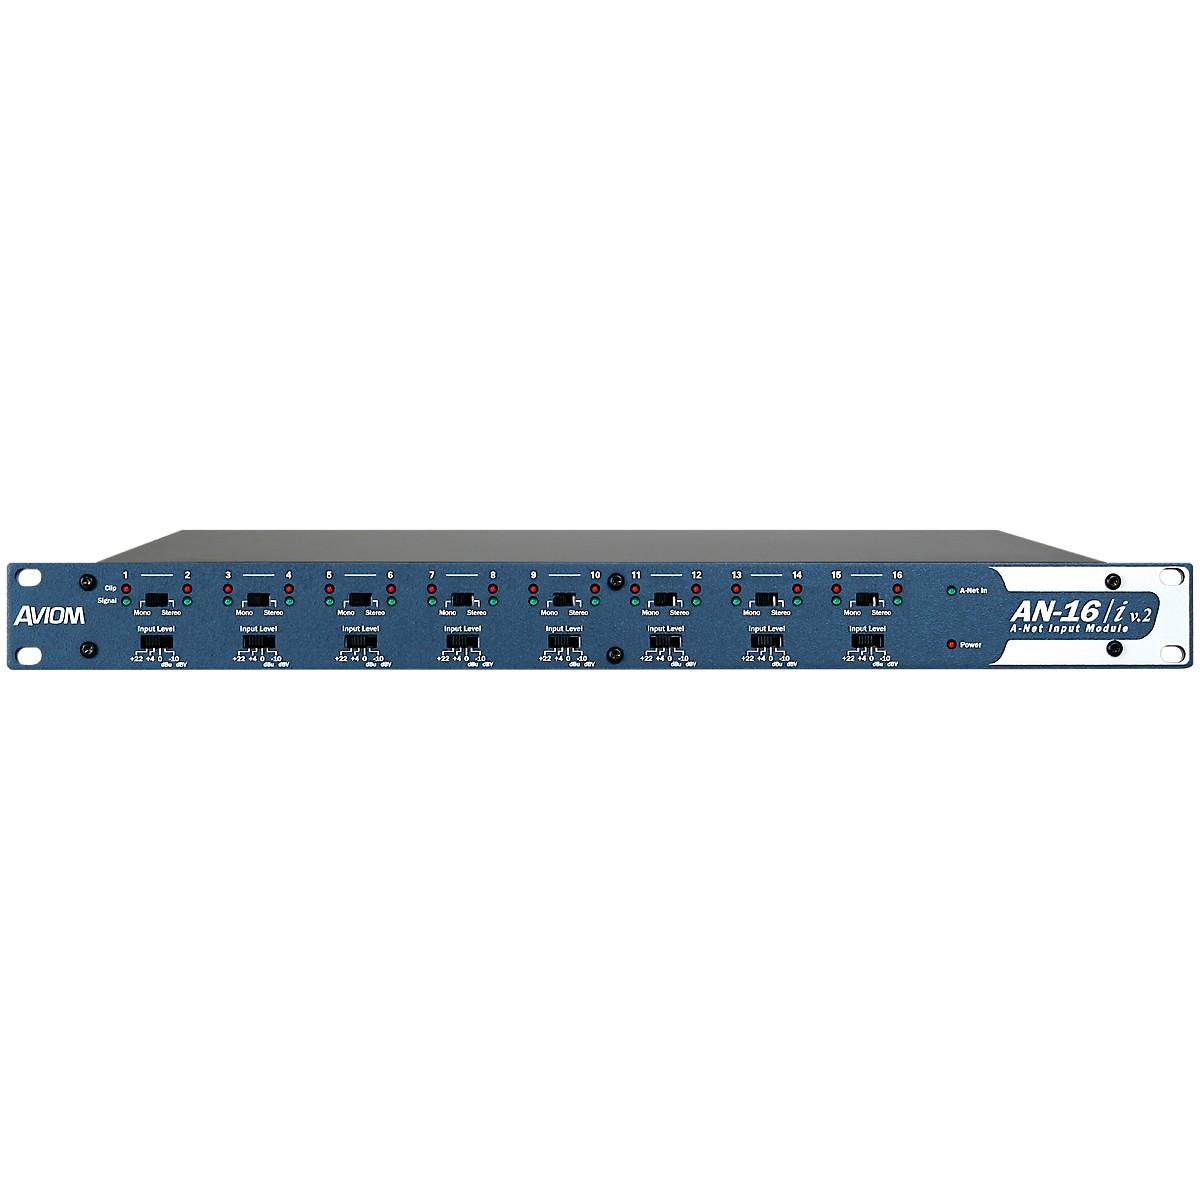 Aviom AN-16/i v.2 Analog Input Module